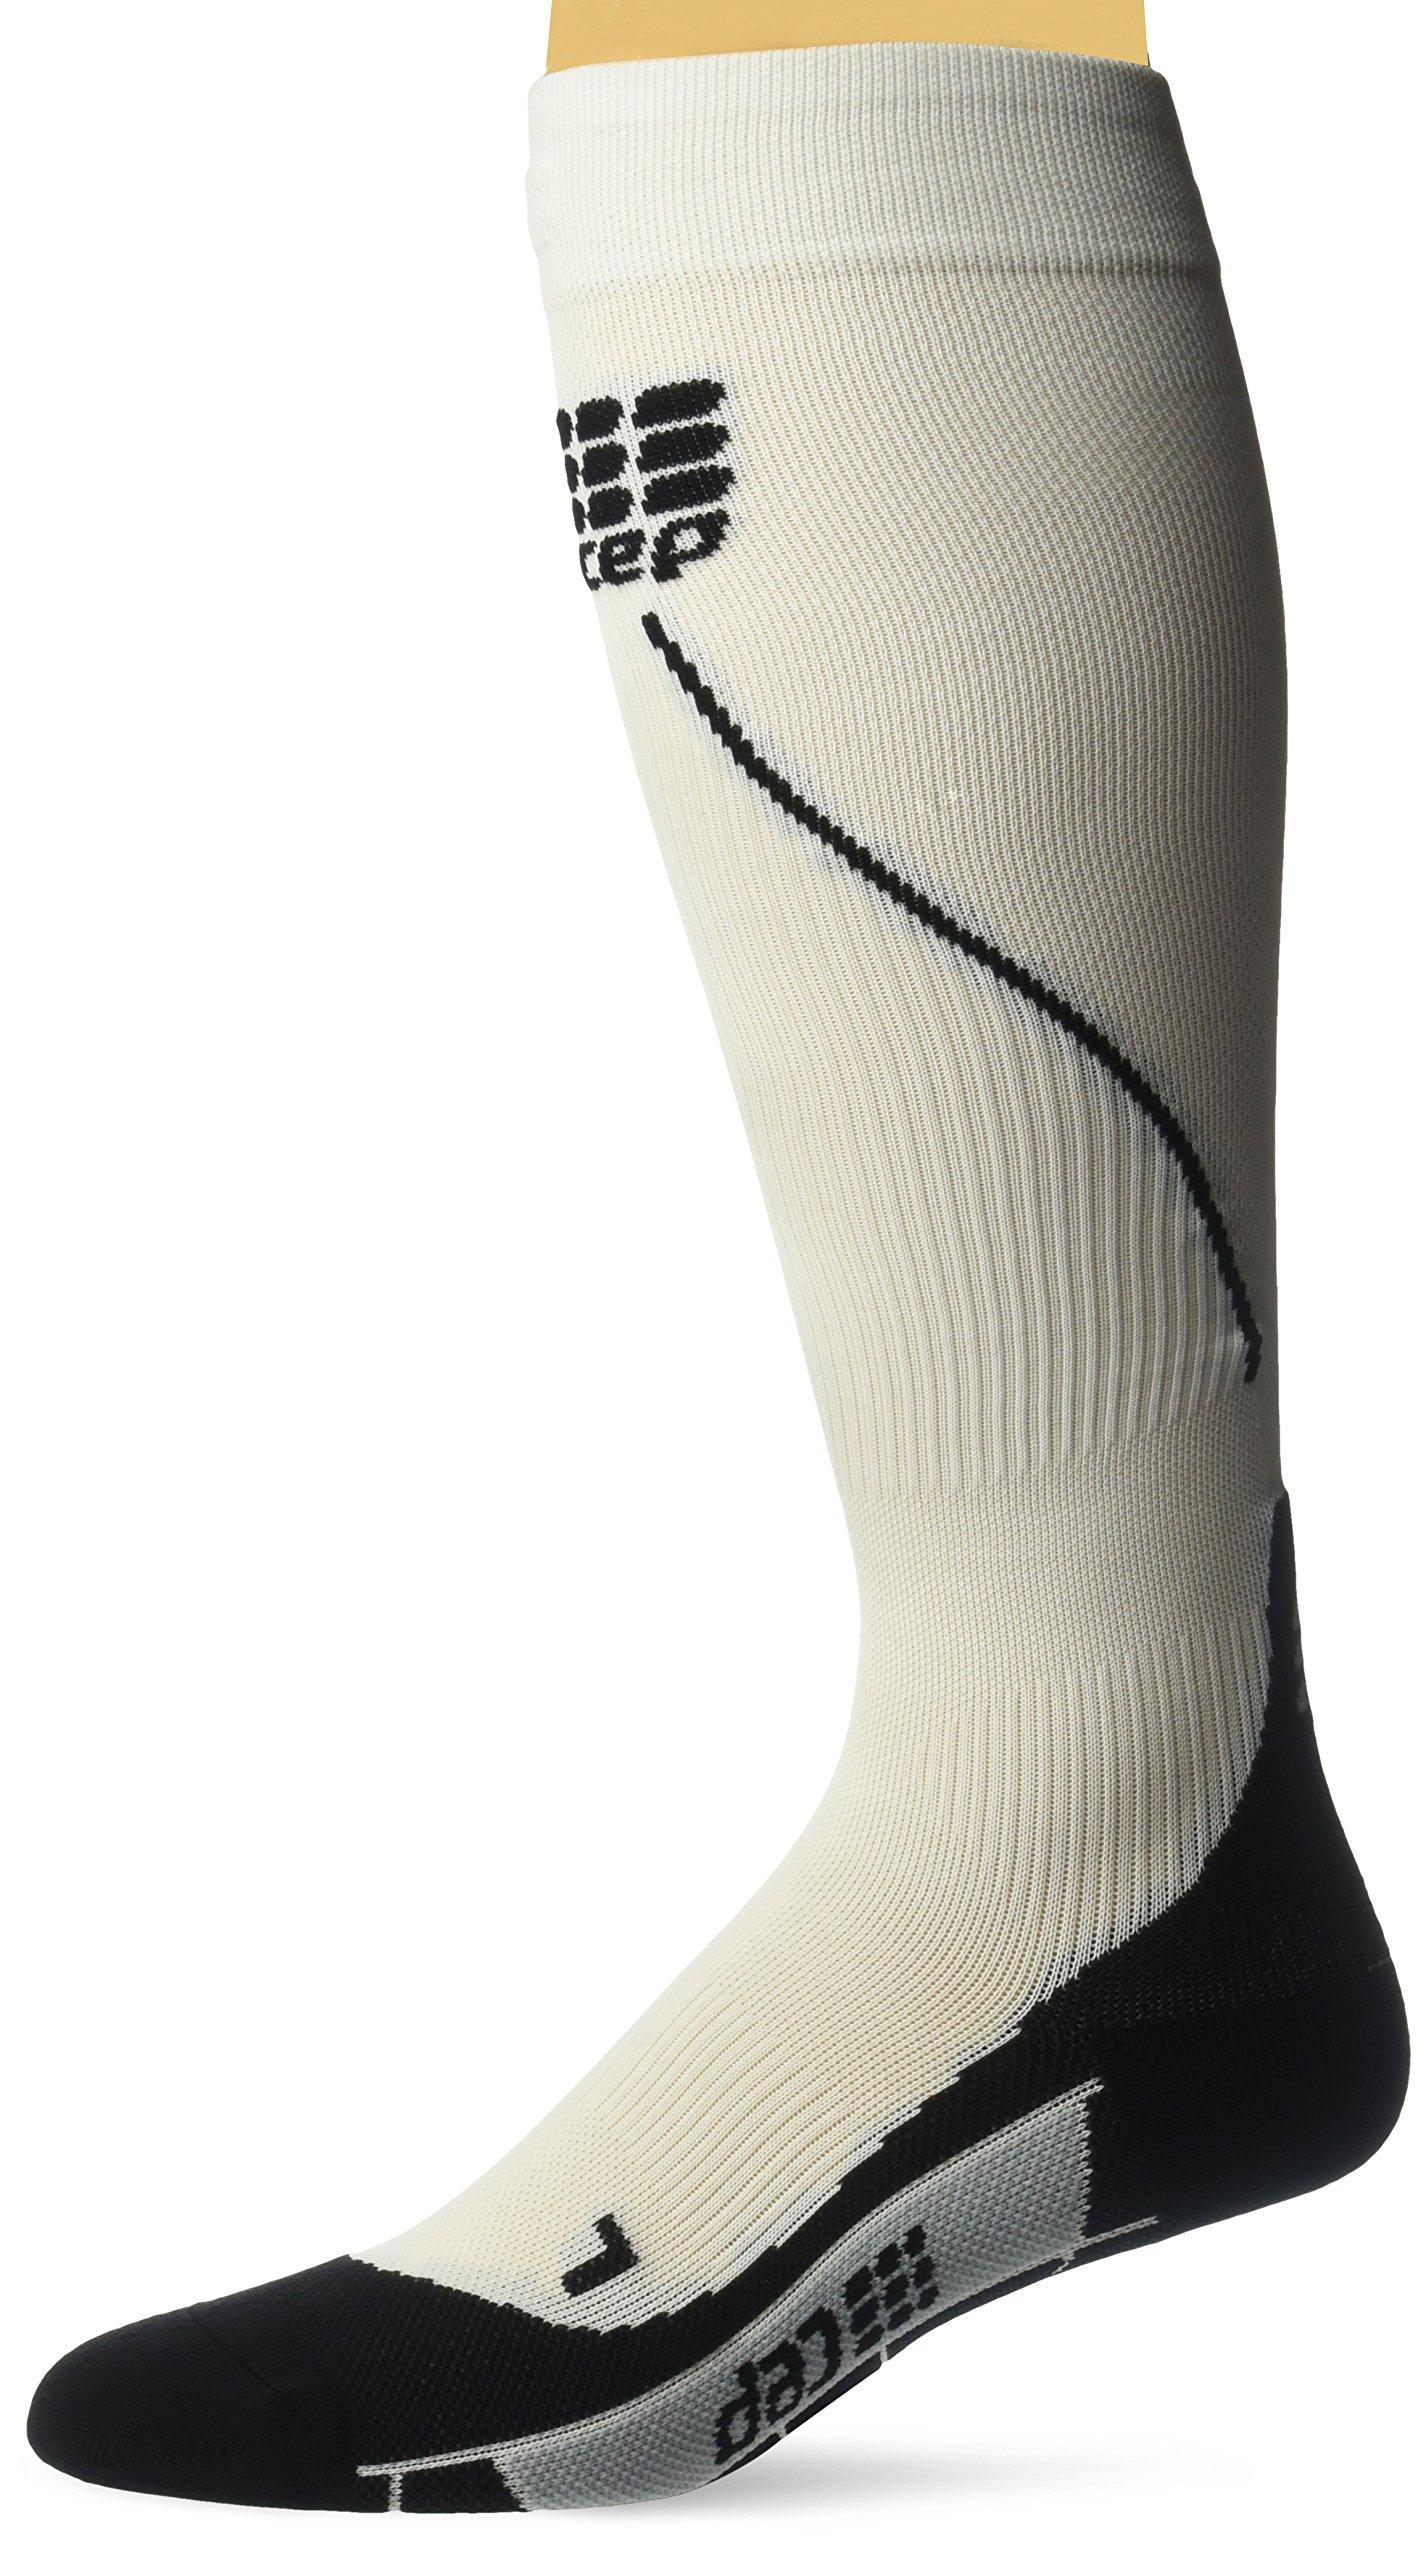 2xu compression socks washing instructions